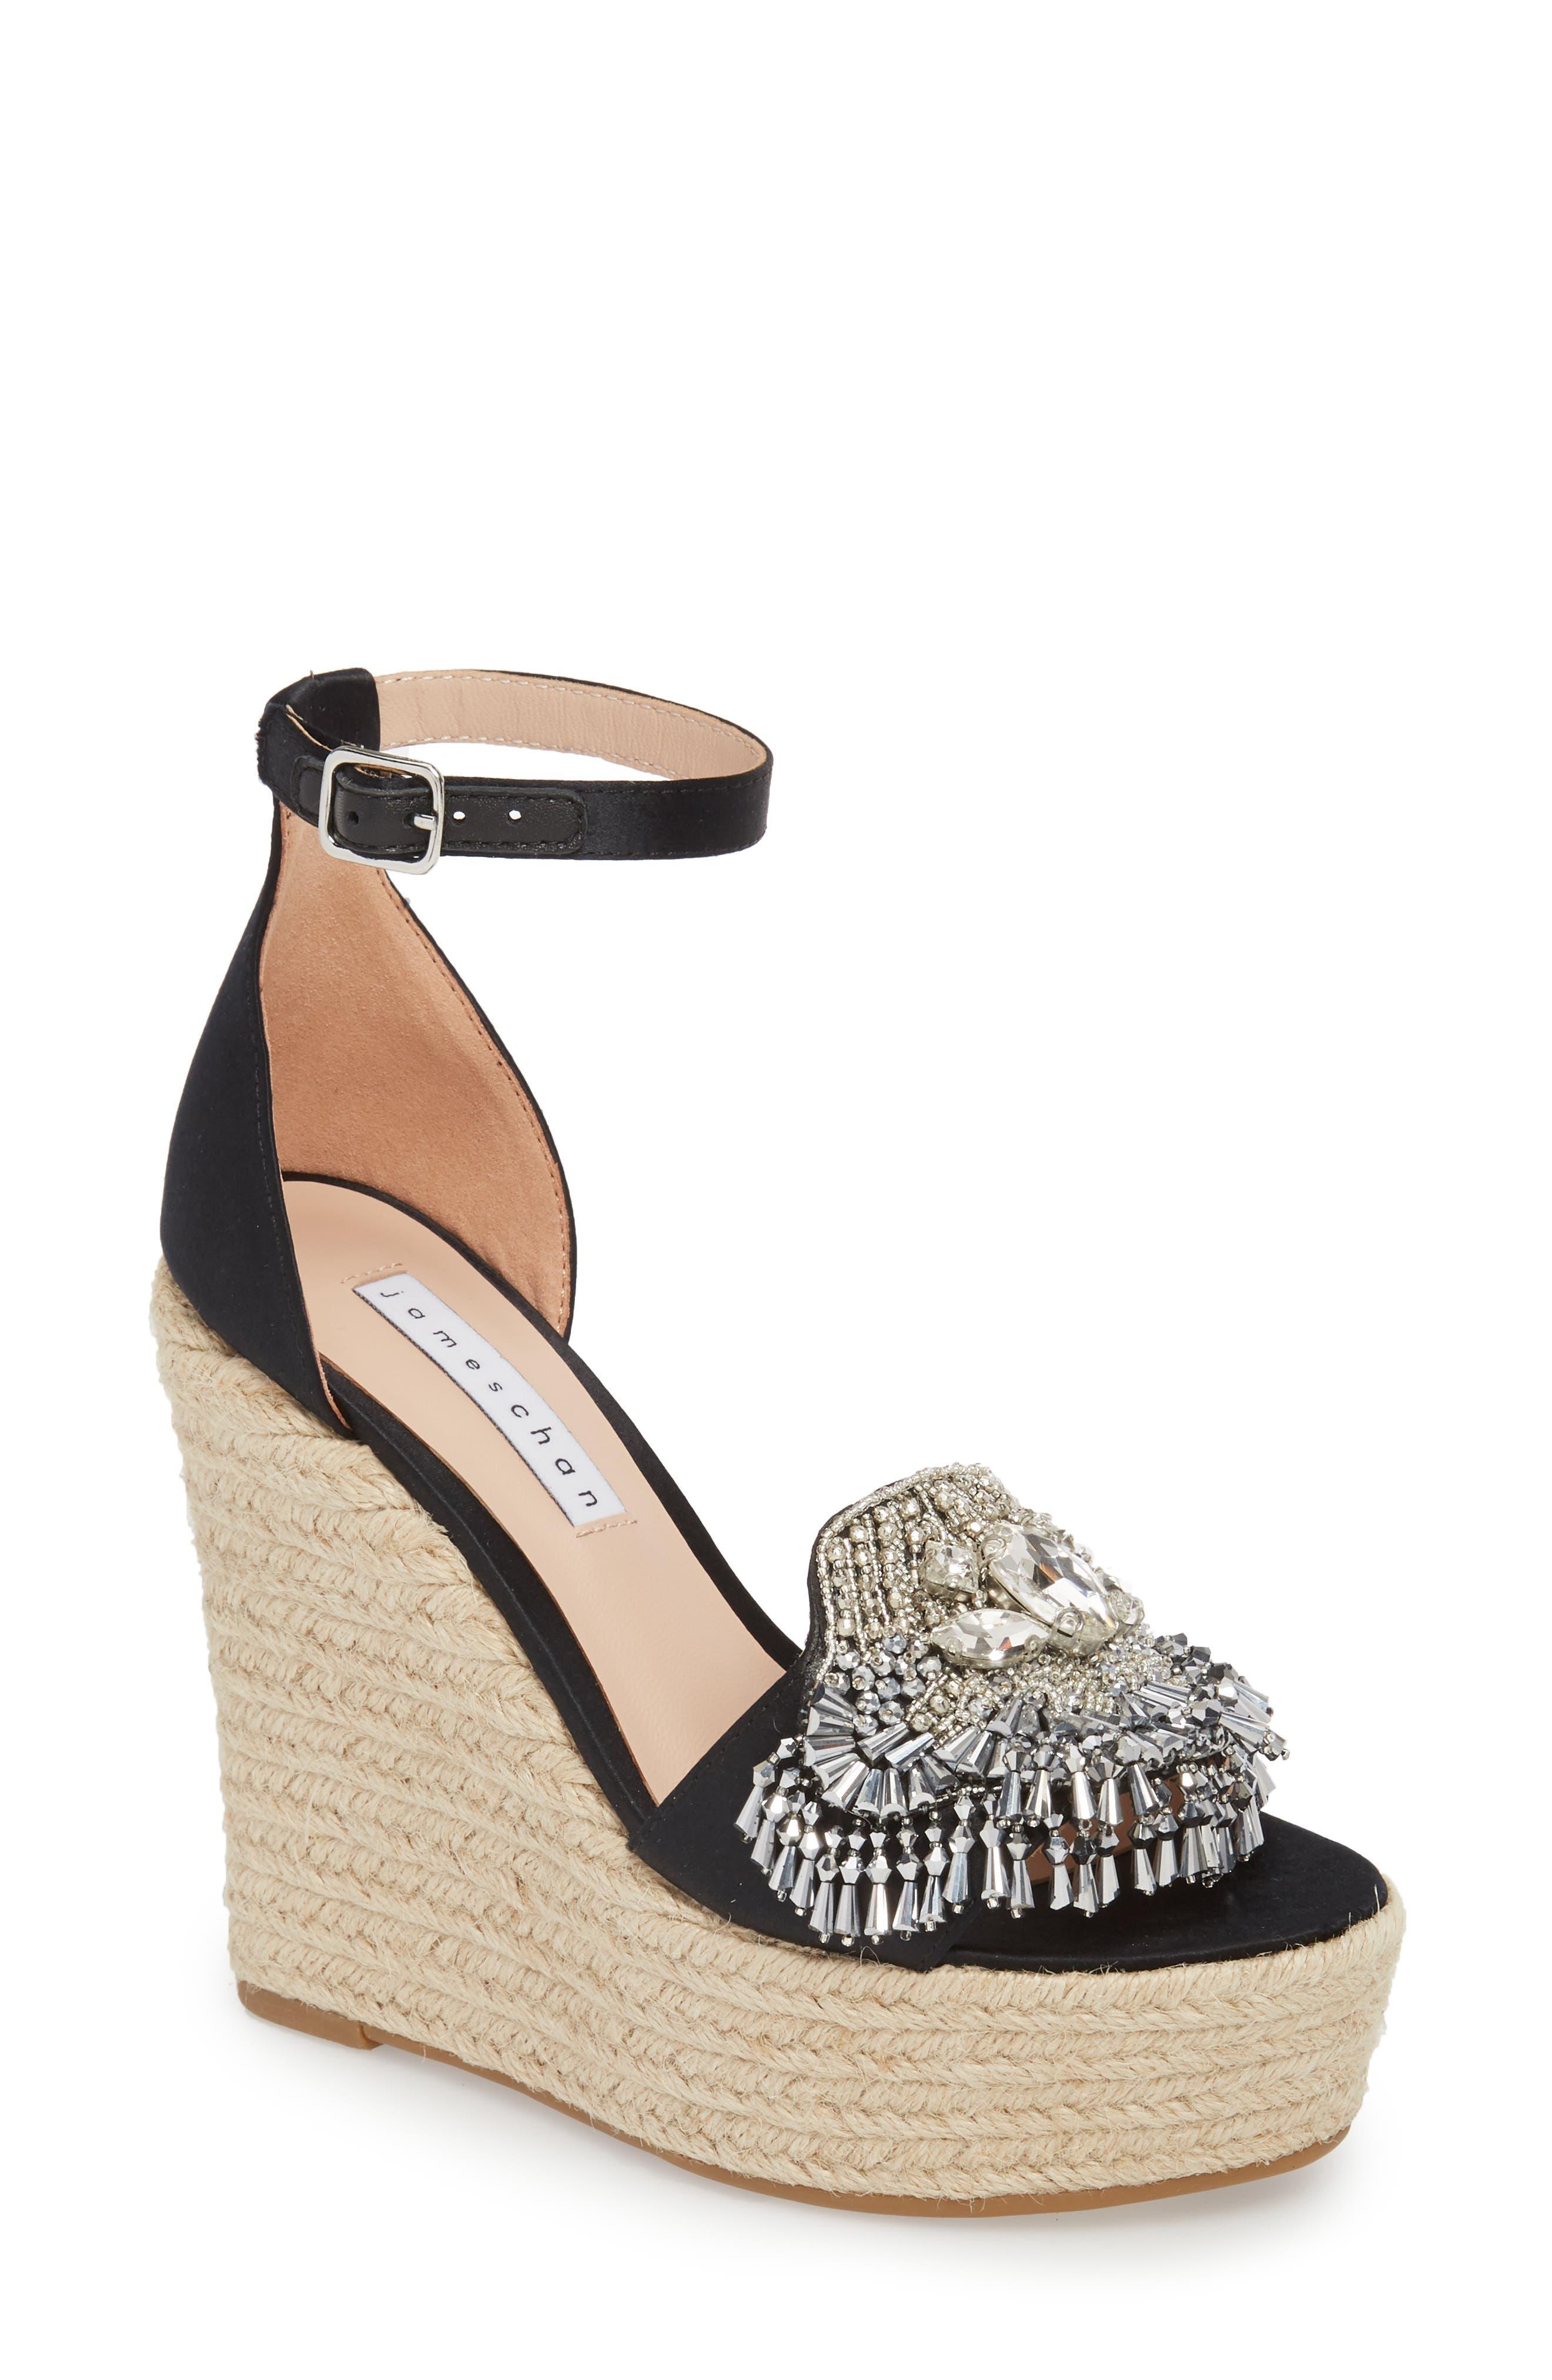 Maxim Platform Wedge Sandal,                         Main,                         color,